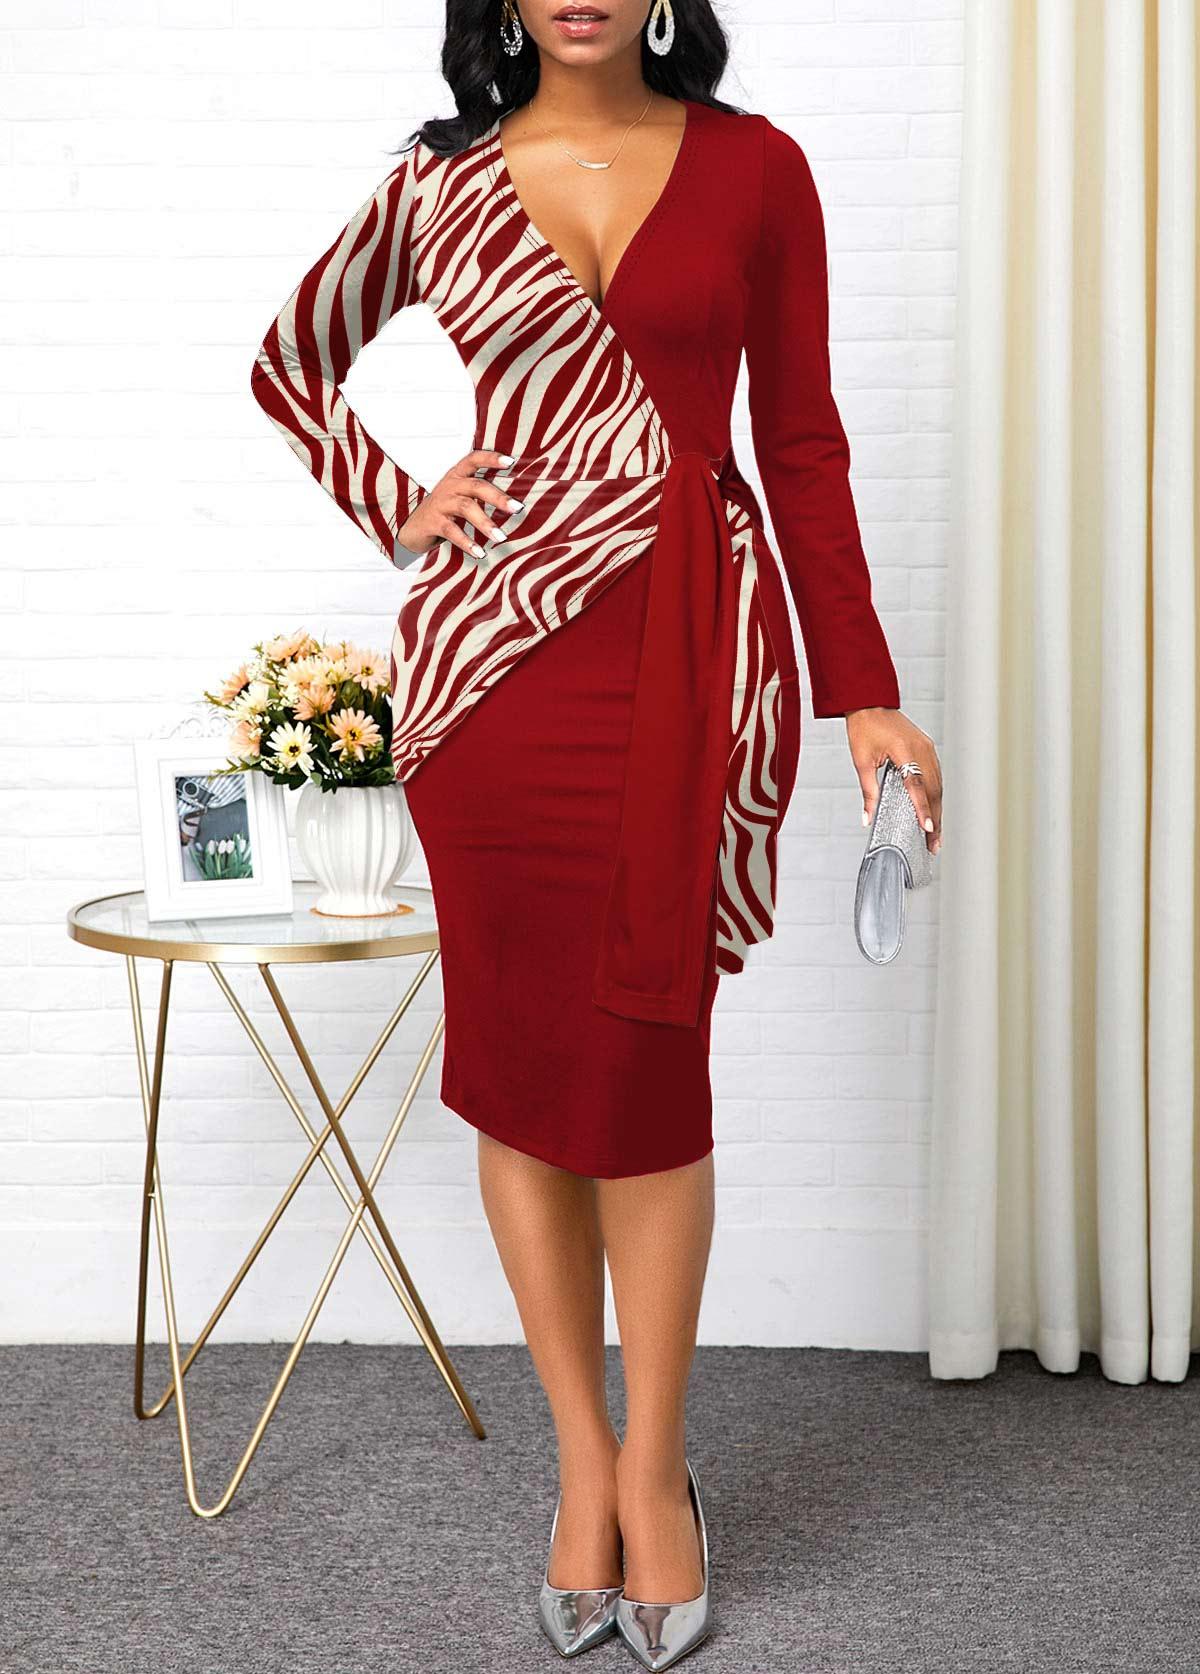 Zebra Print Long Sleeve Plunging Neck Dress